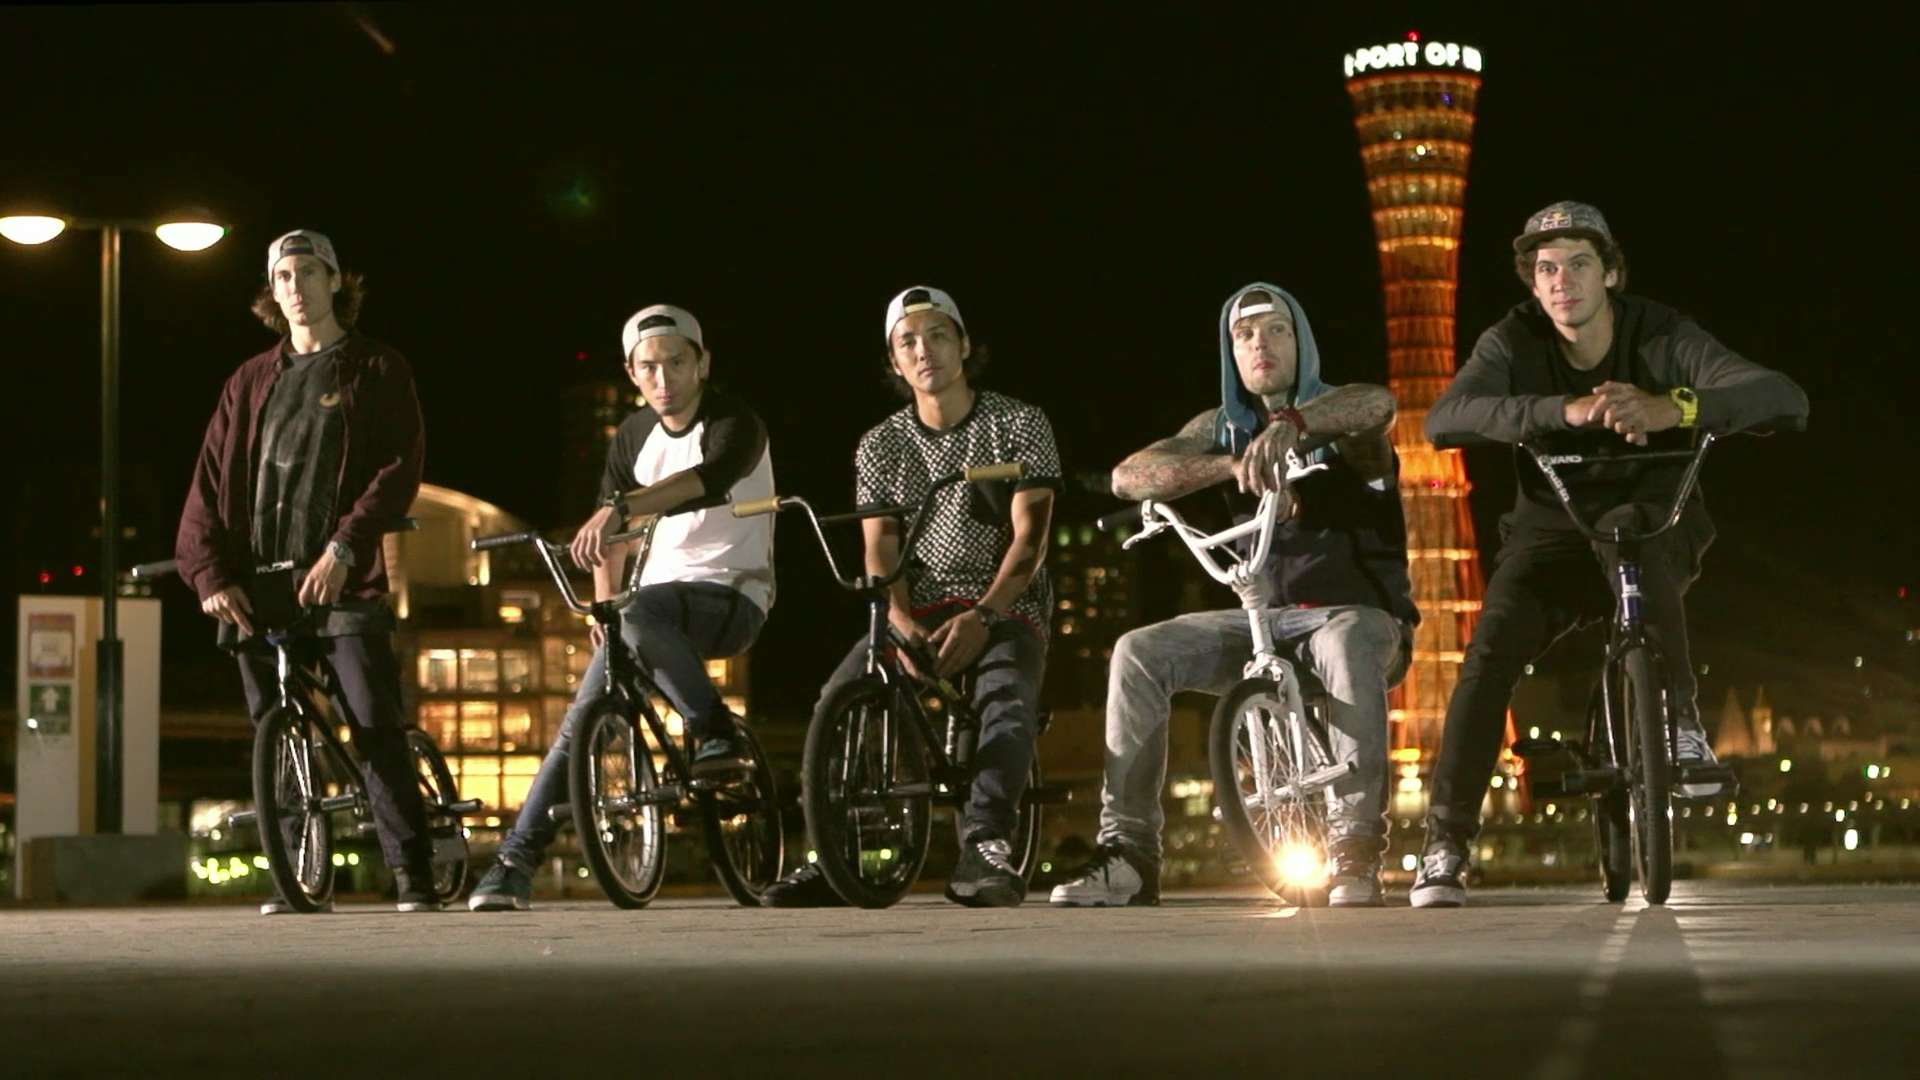 G-SHOCK TEAM G-SHOCK BMX FLATLAND Crew J